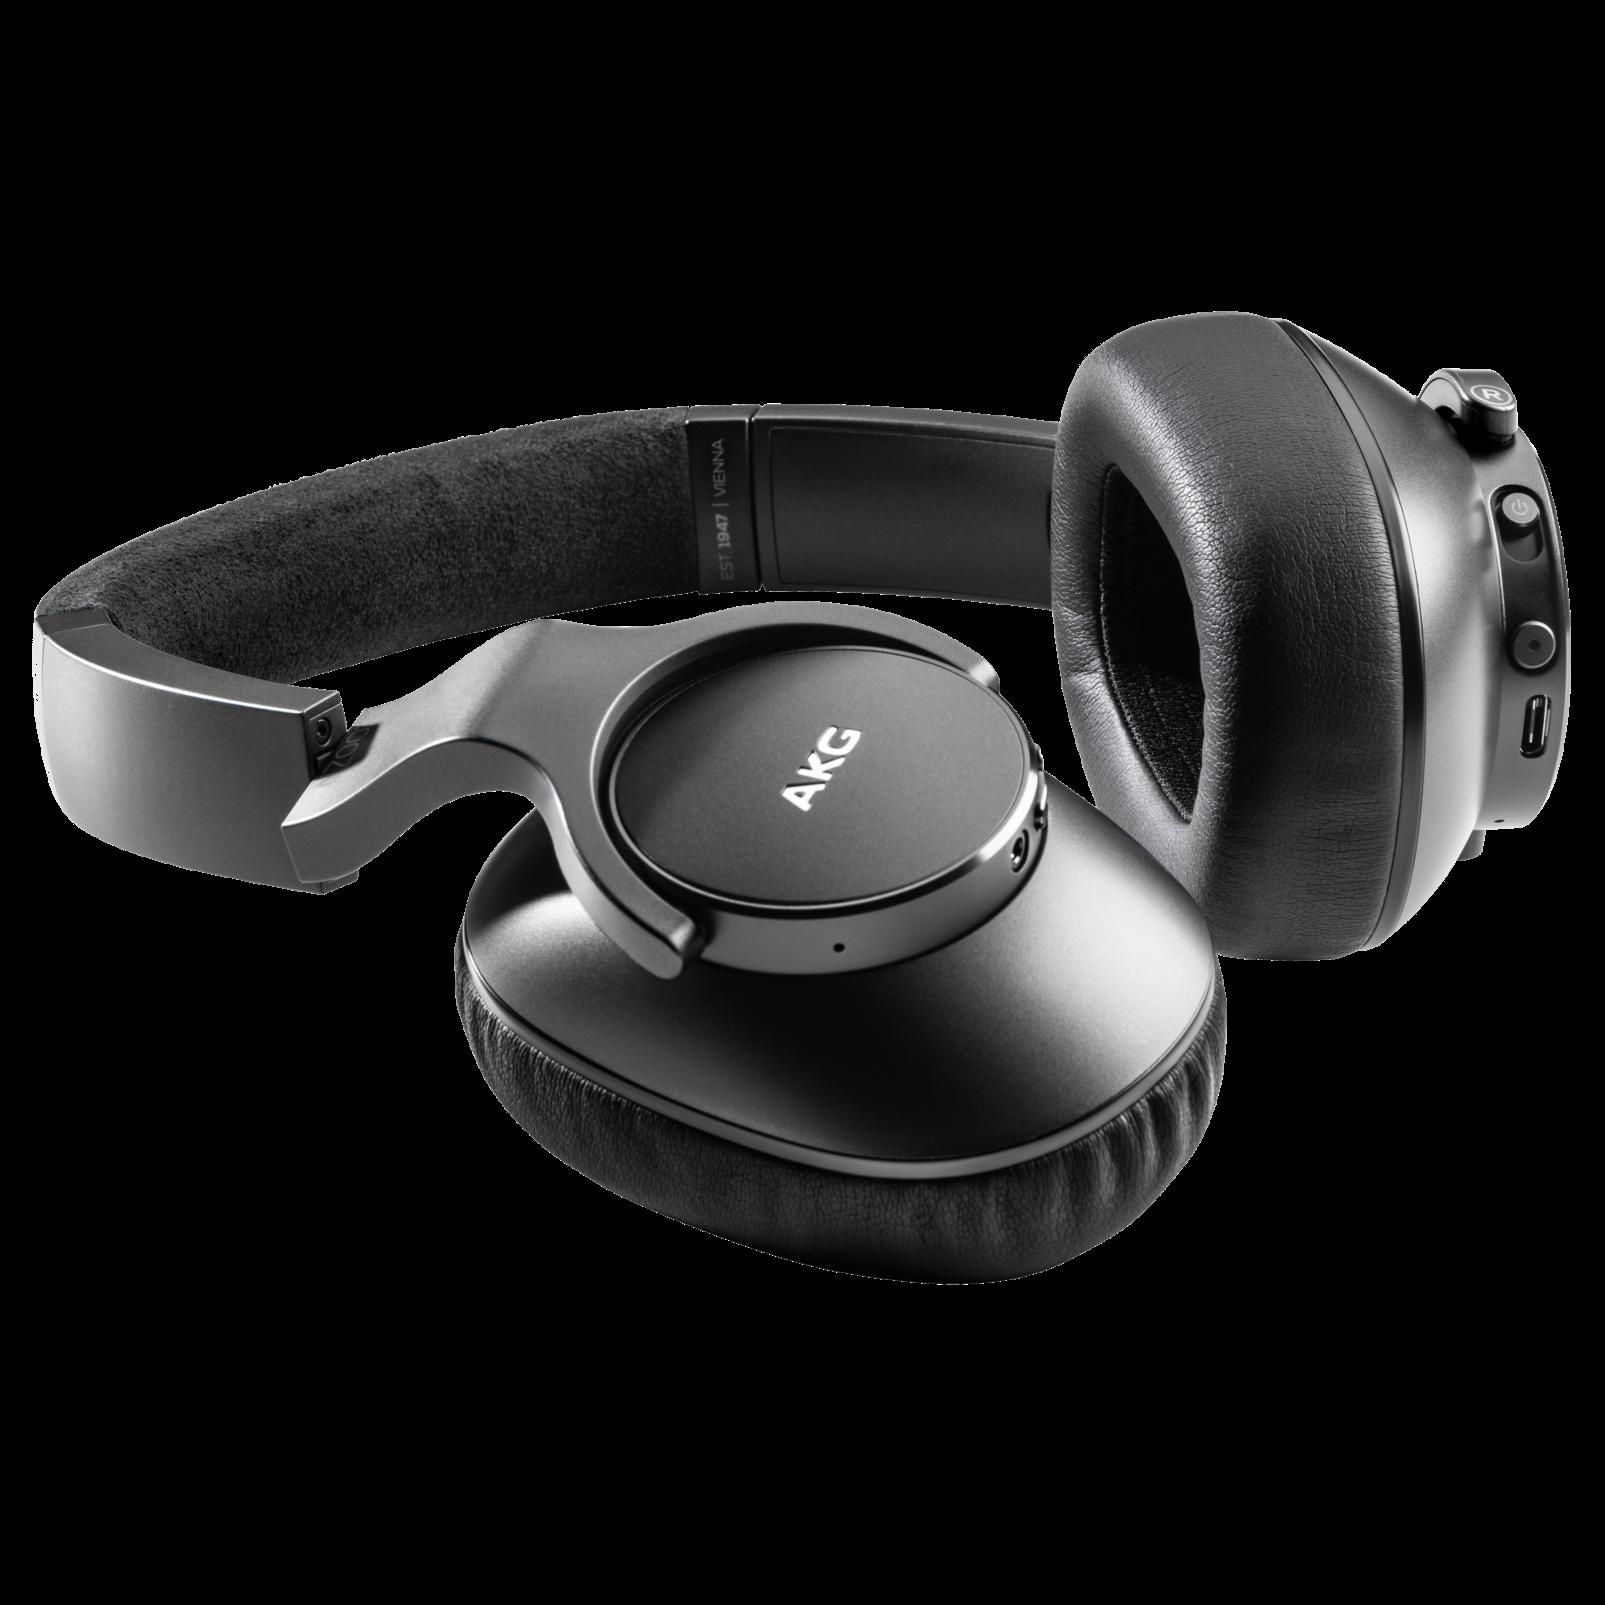 AKG N700NCM2 WIRELESS - Black - Wireless, Adaptive Noise Cancelling Headphones - Detailshot 1